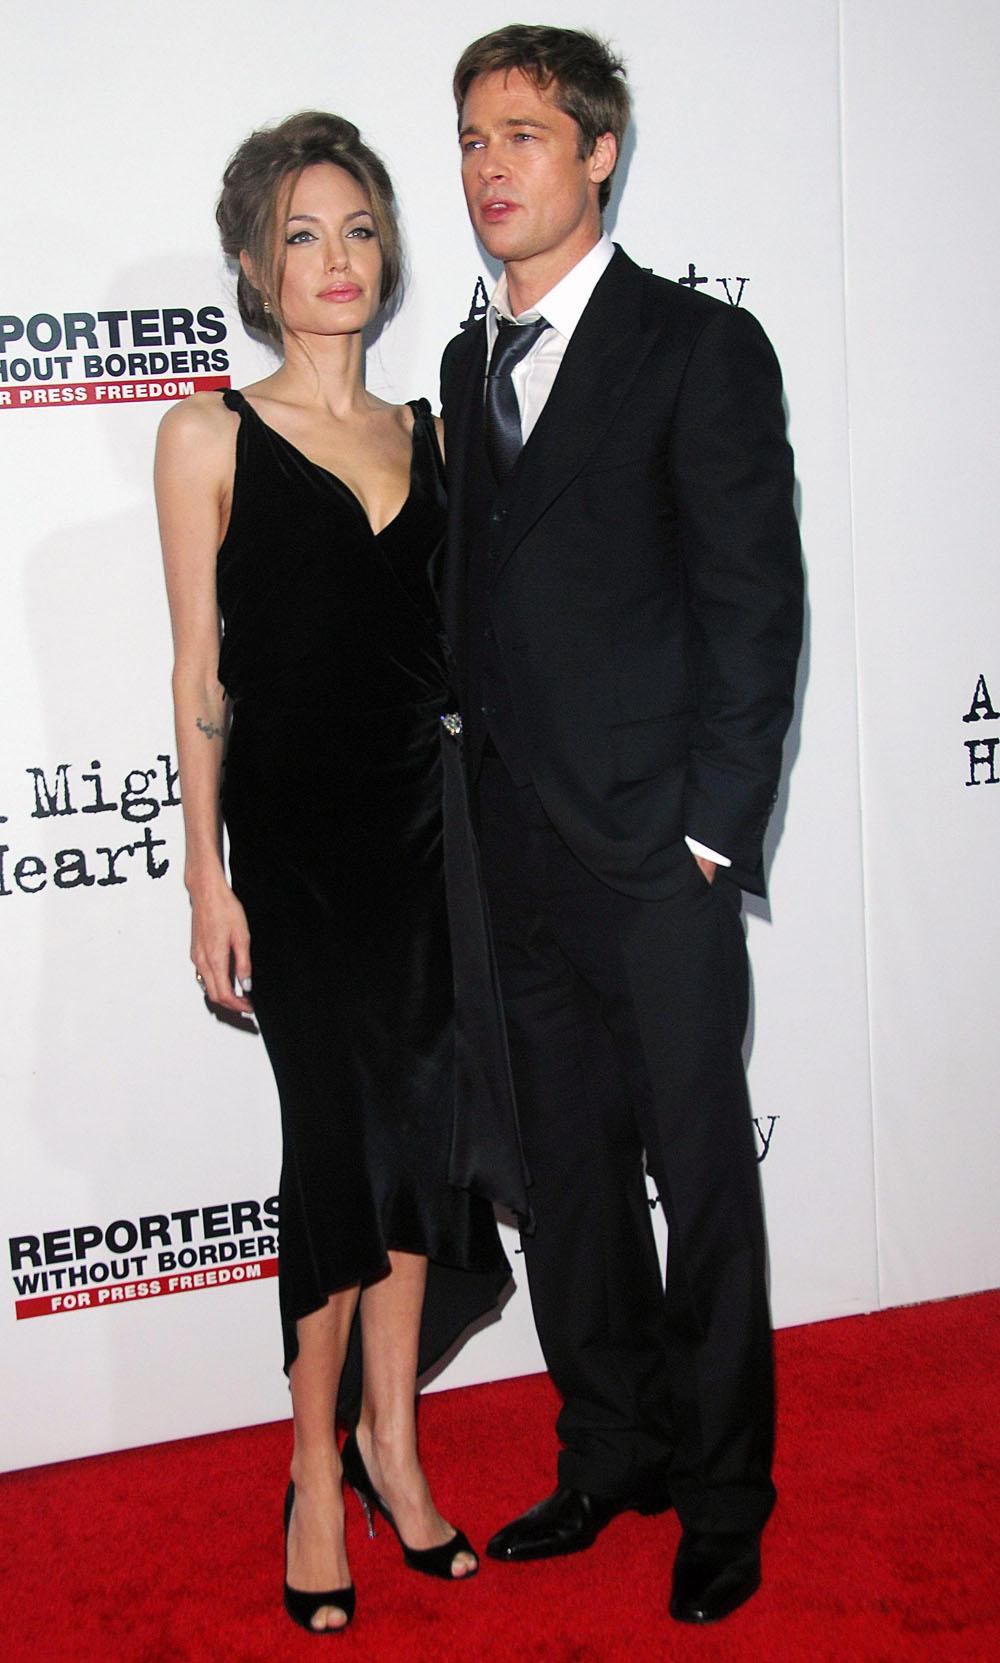 bdb48cb7aa16 Style Icons  Brad Pitt and Angelina Jolie